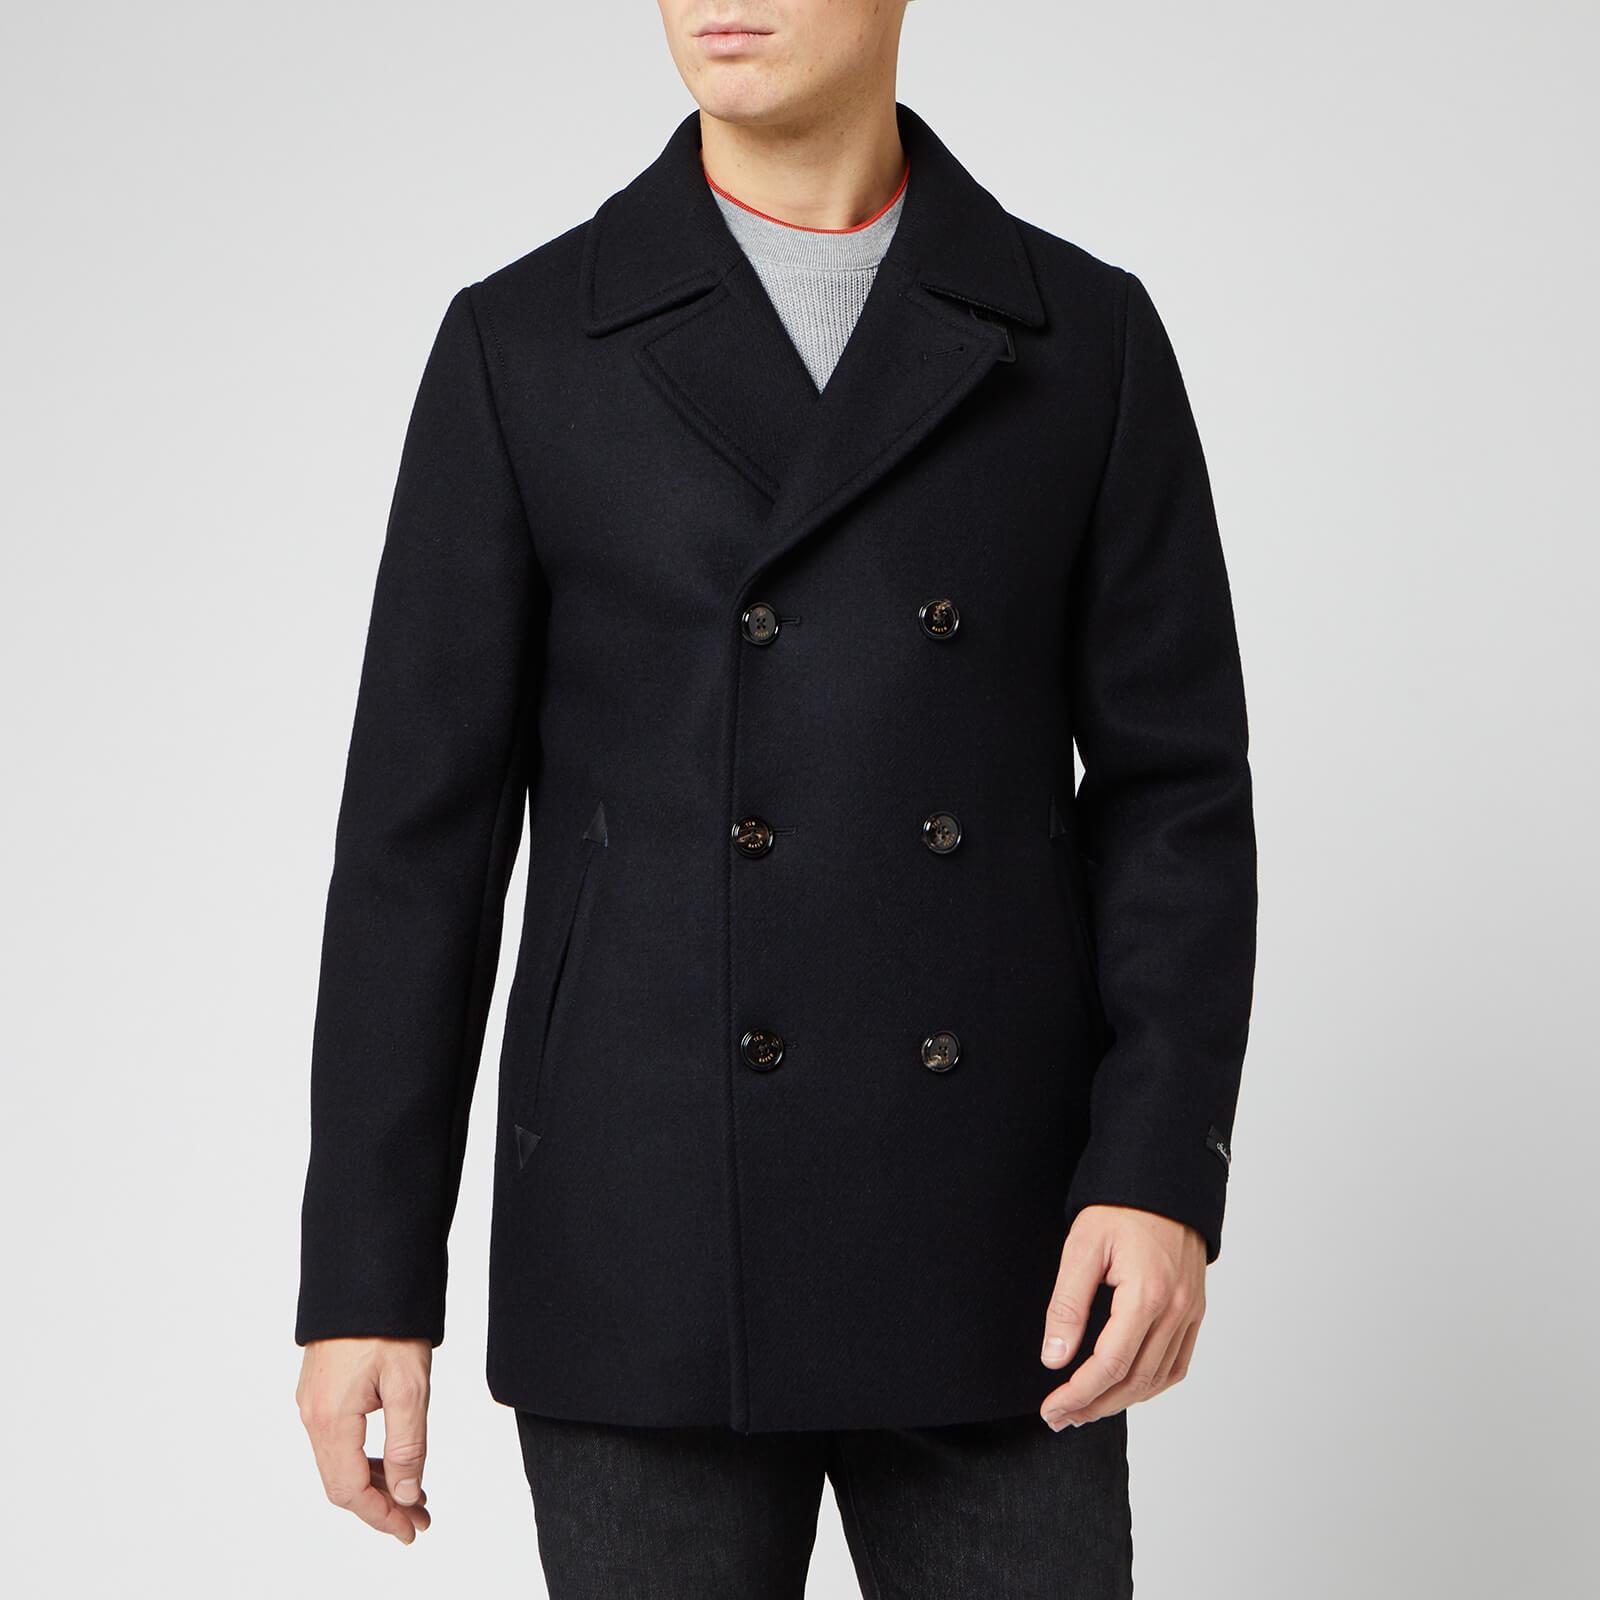 Ted Baker Men's Westun Wool Peacoat - Navy - L/4